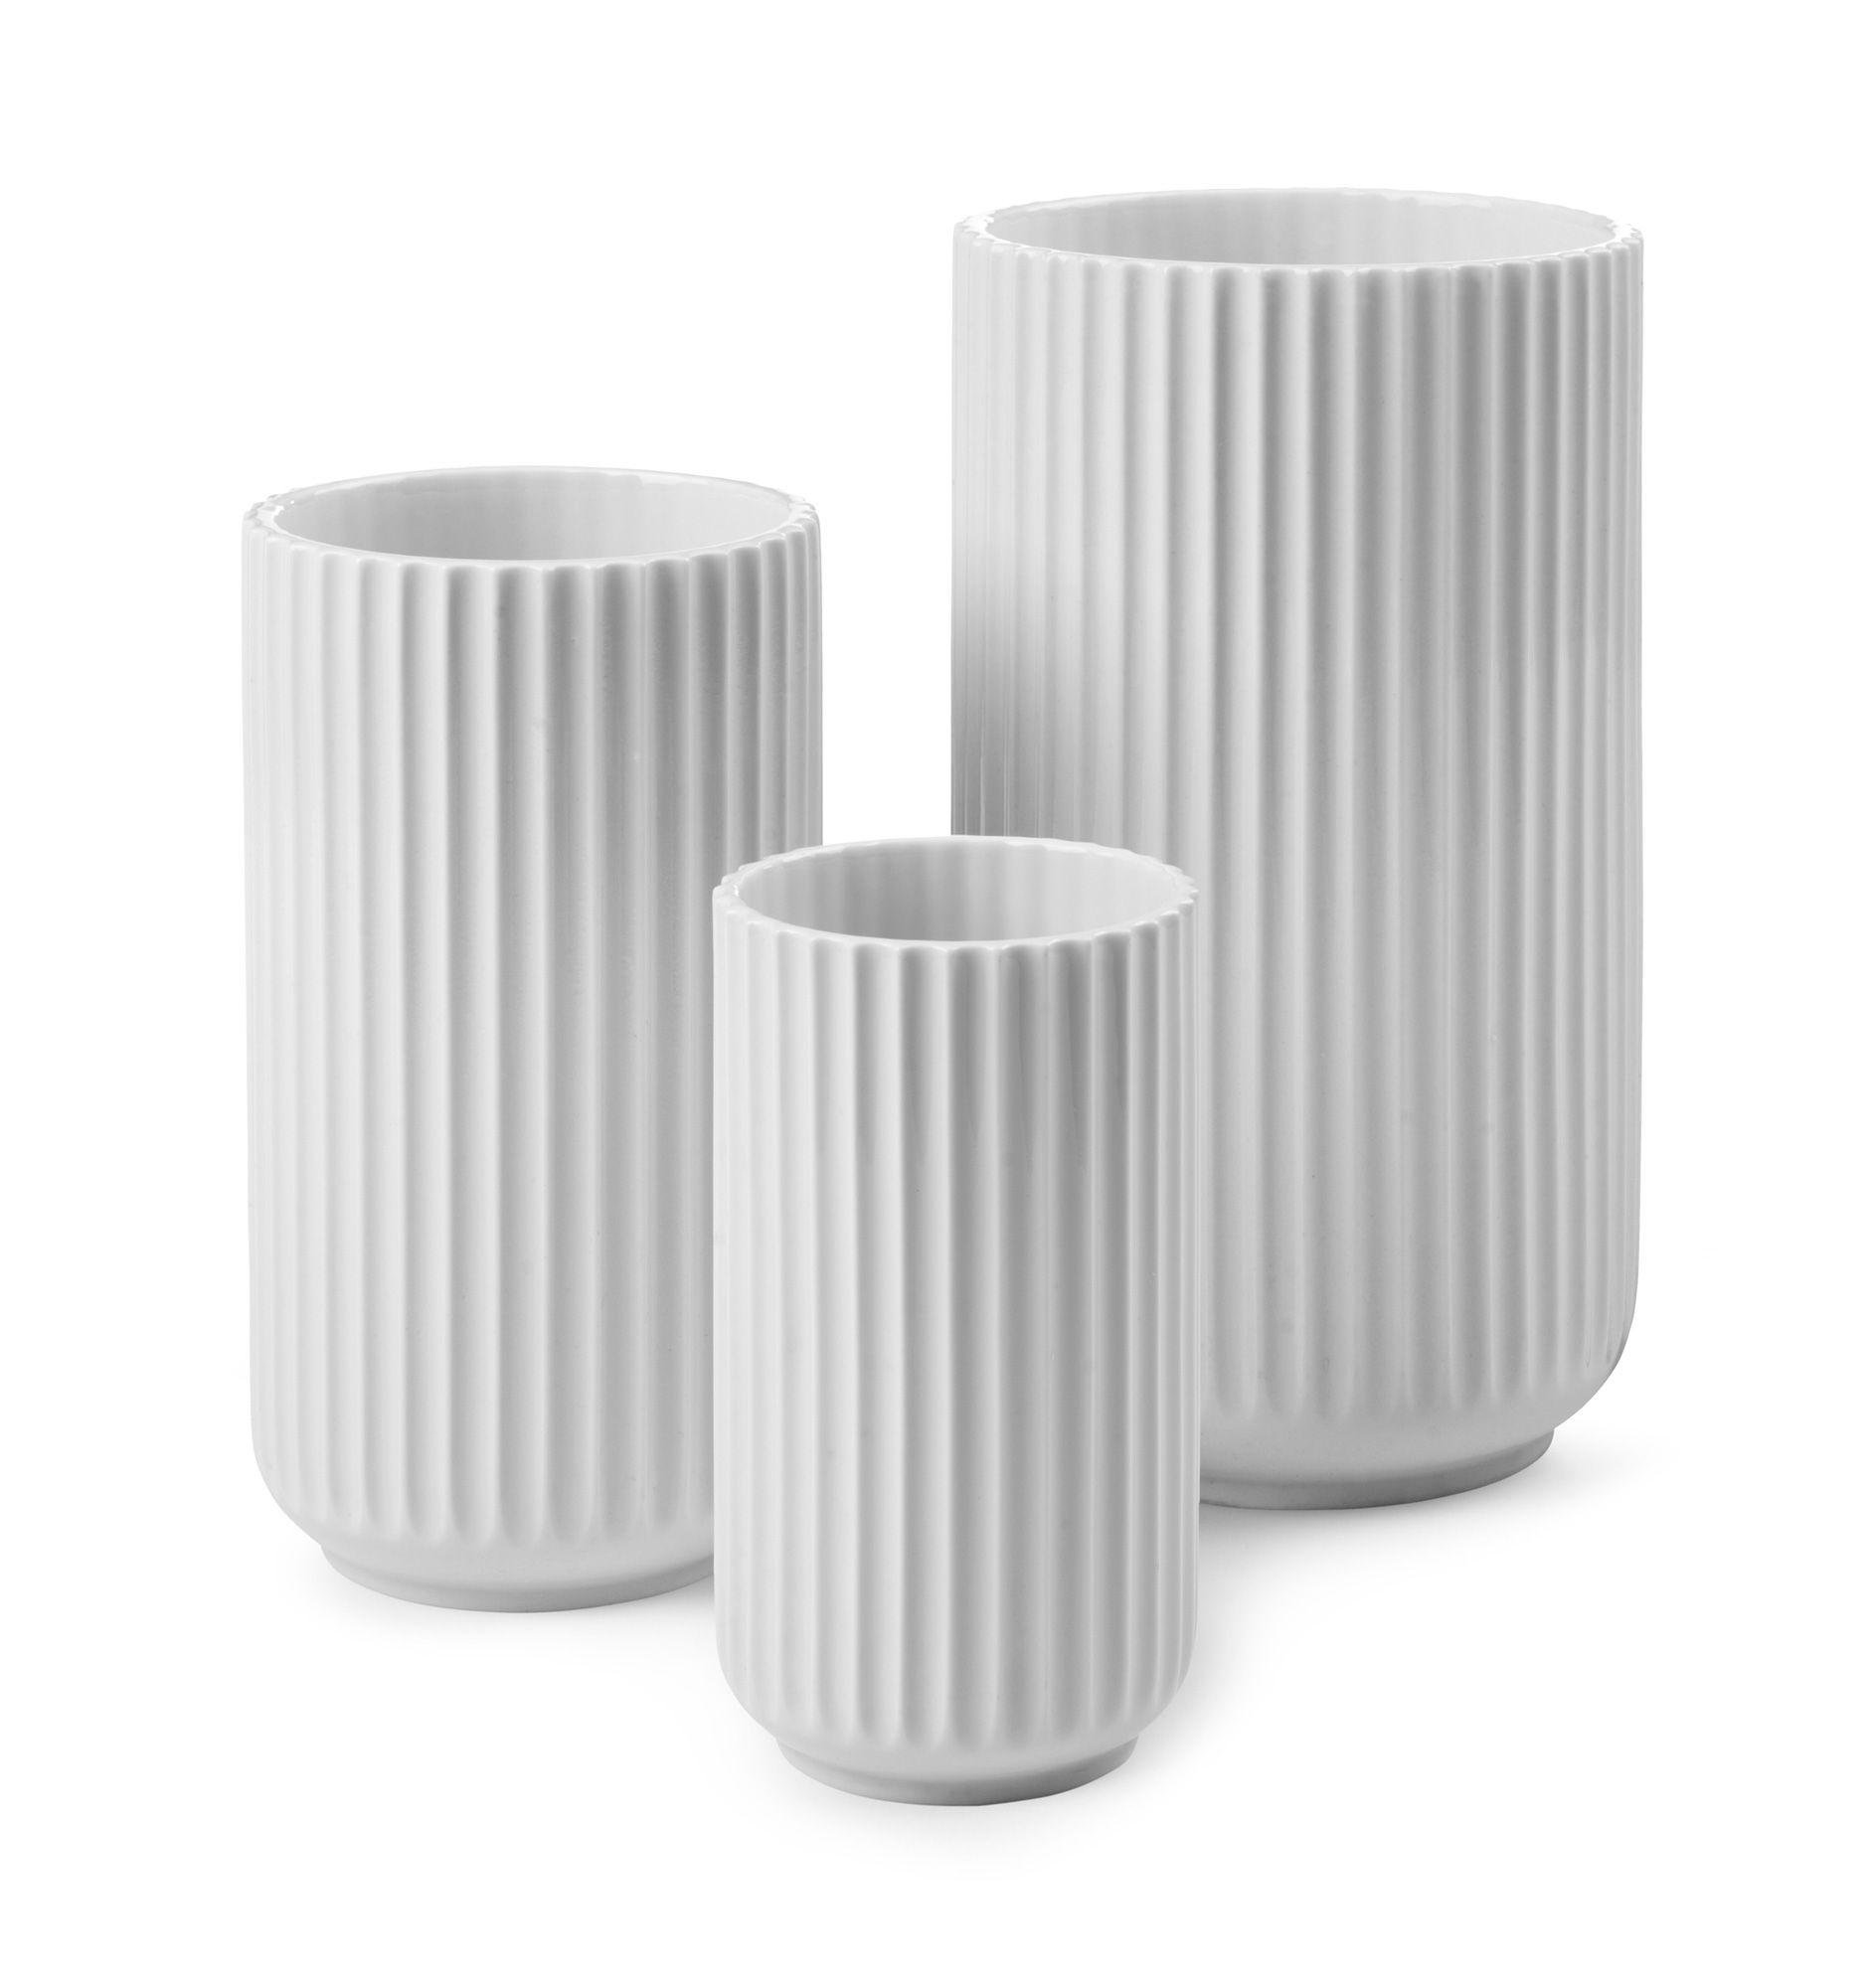 Lyngby vase i mellem størrelse ✔️